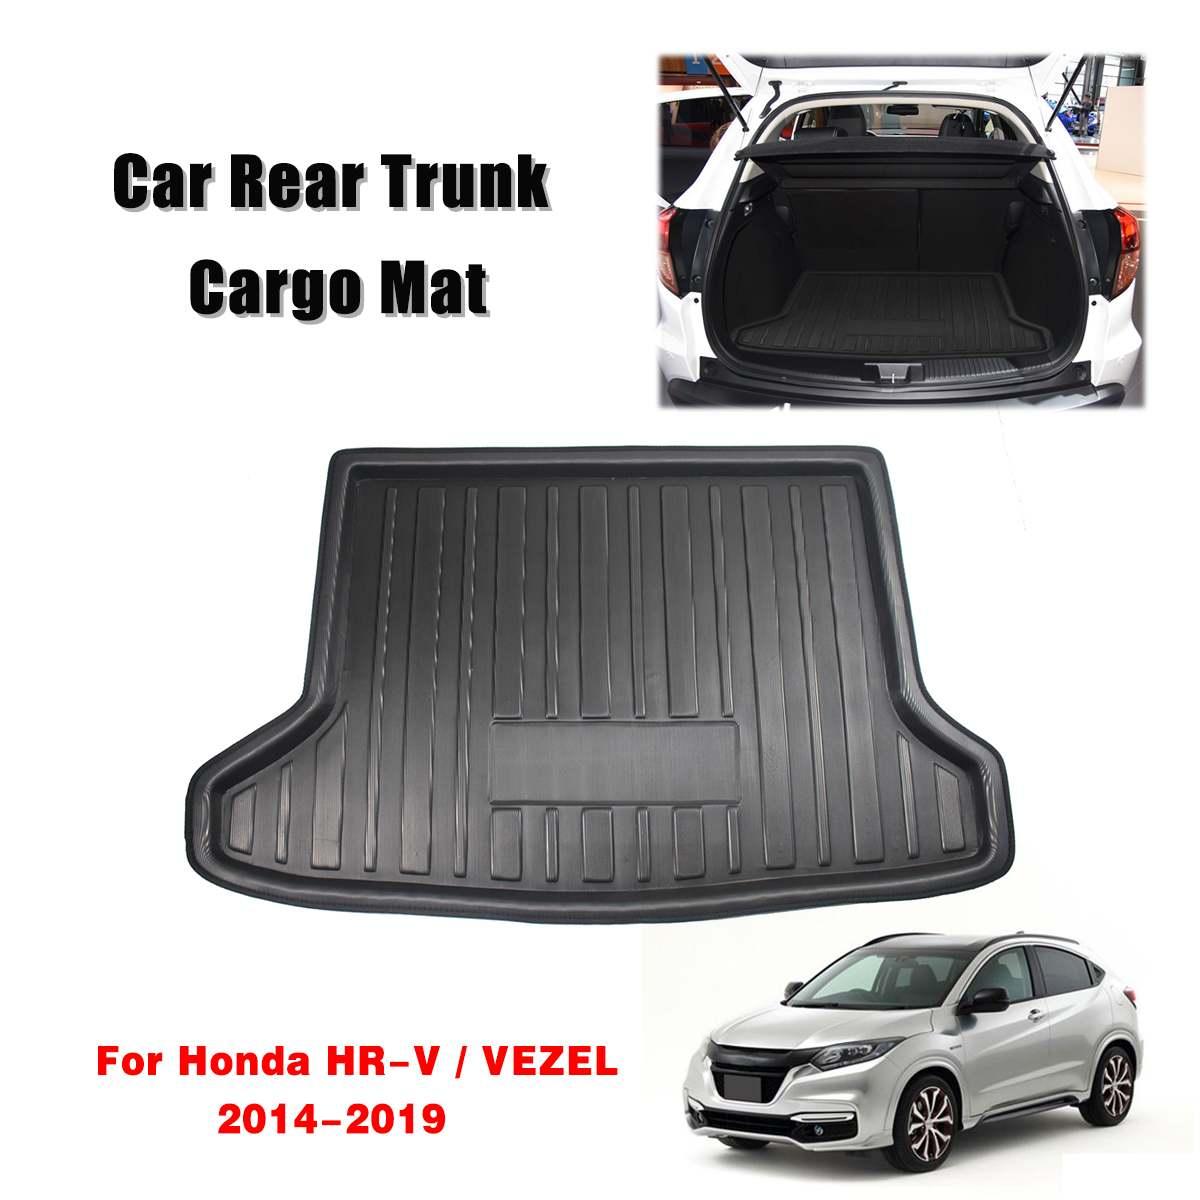 Cargo Liner Boot Tray Rear Trunk Cover Matt Mat Floor Carpet Kick Pad Mud Non-slip Anti Dust For Honda HR-V Vezel HRV 2014 -2019